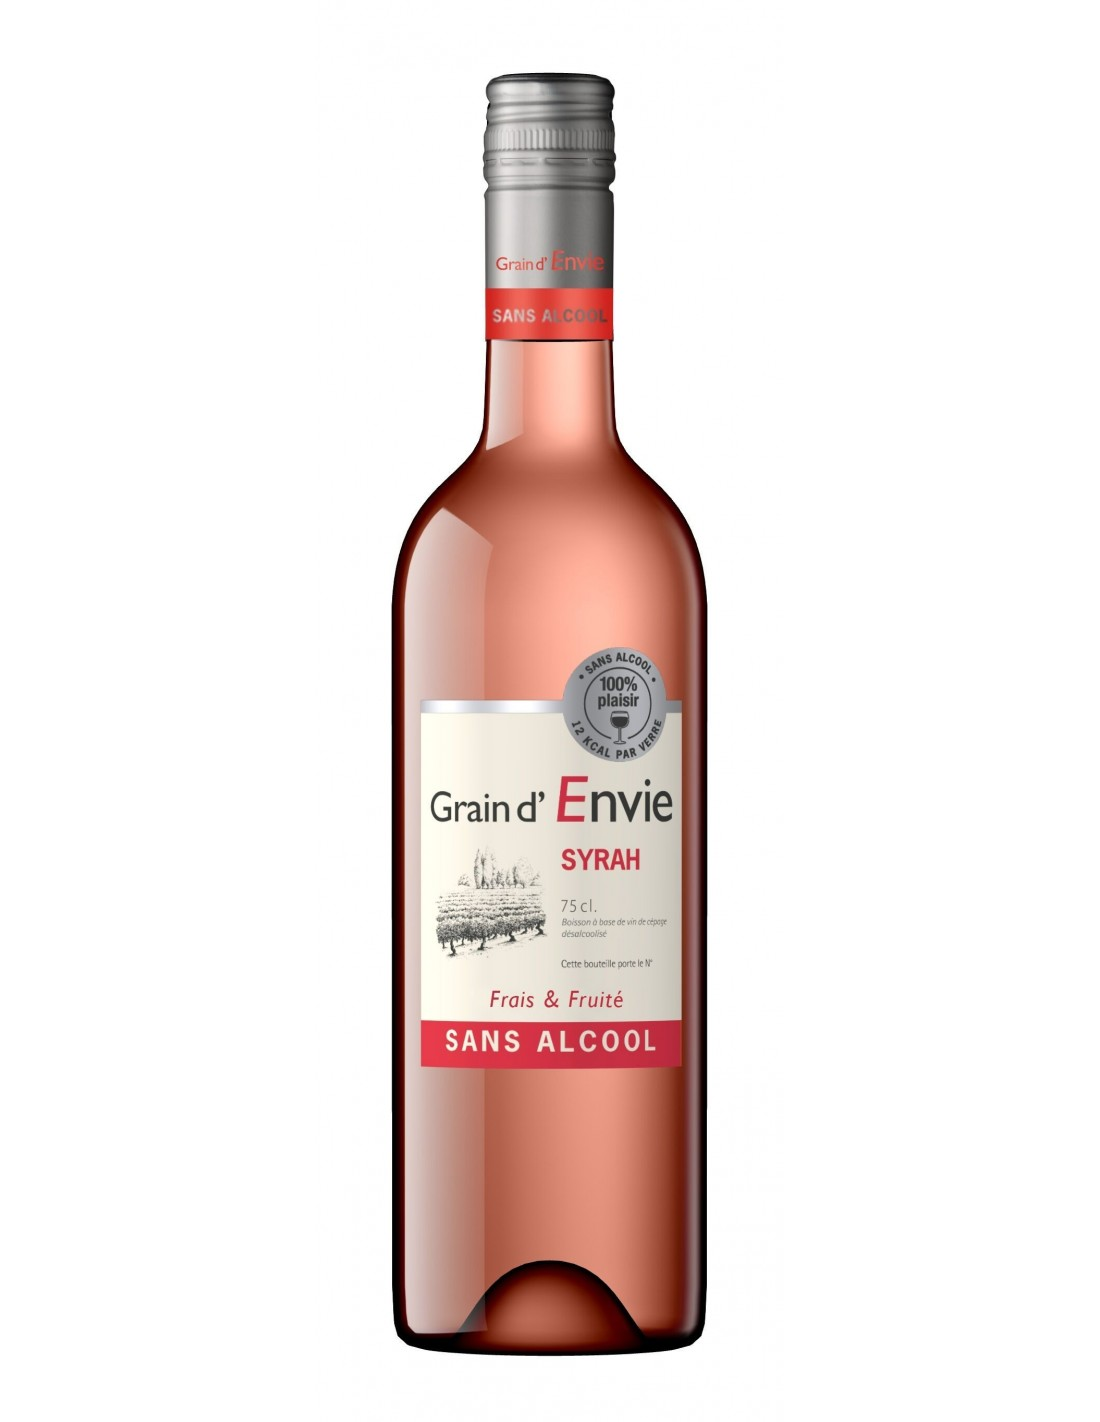 Vin roze, Syrah, Grain d'Envie Fara Alcool, 0.75L, 0% alc., Franta